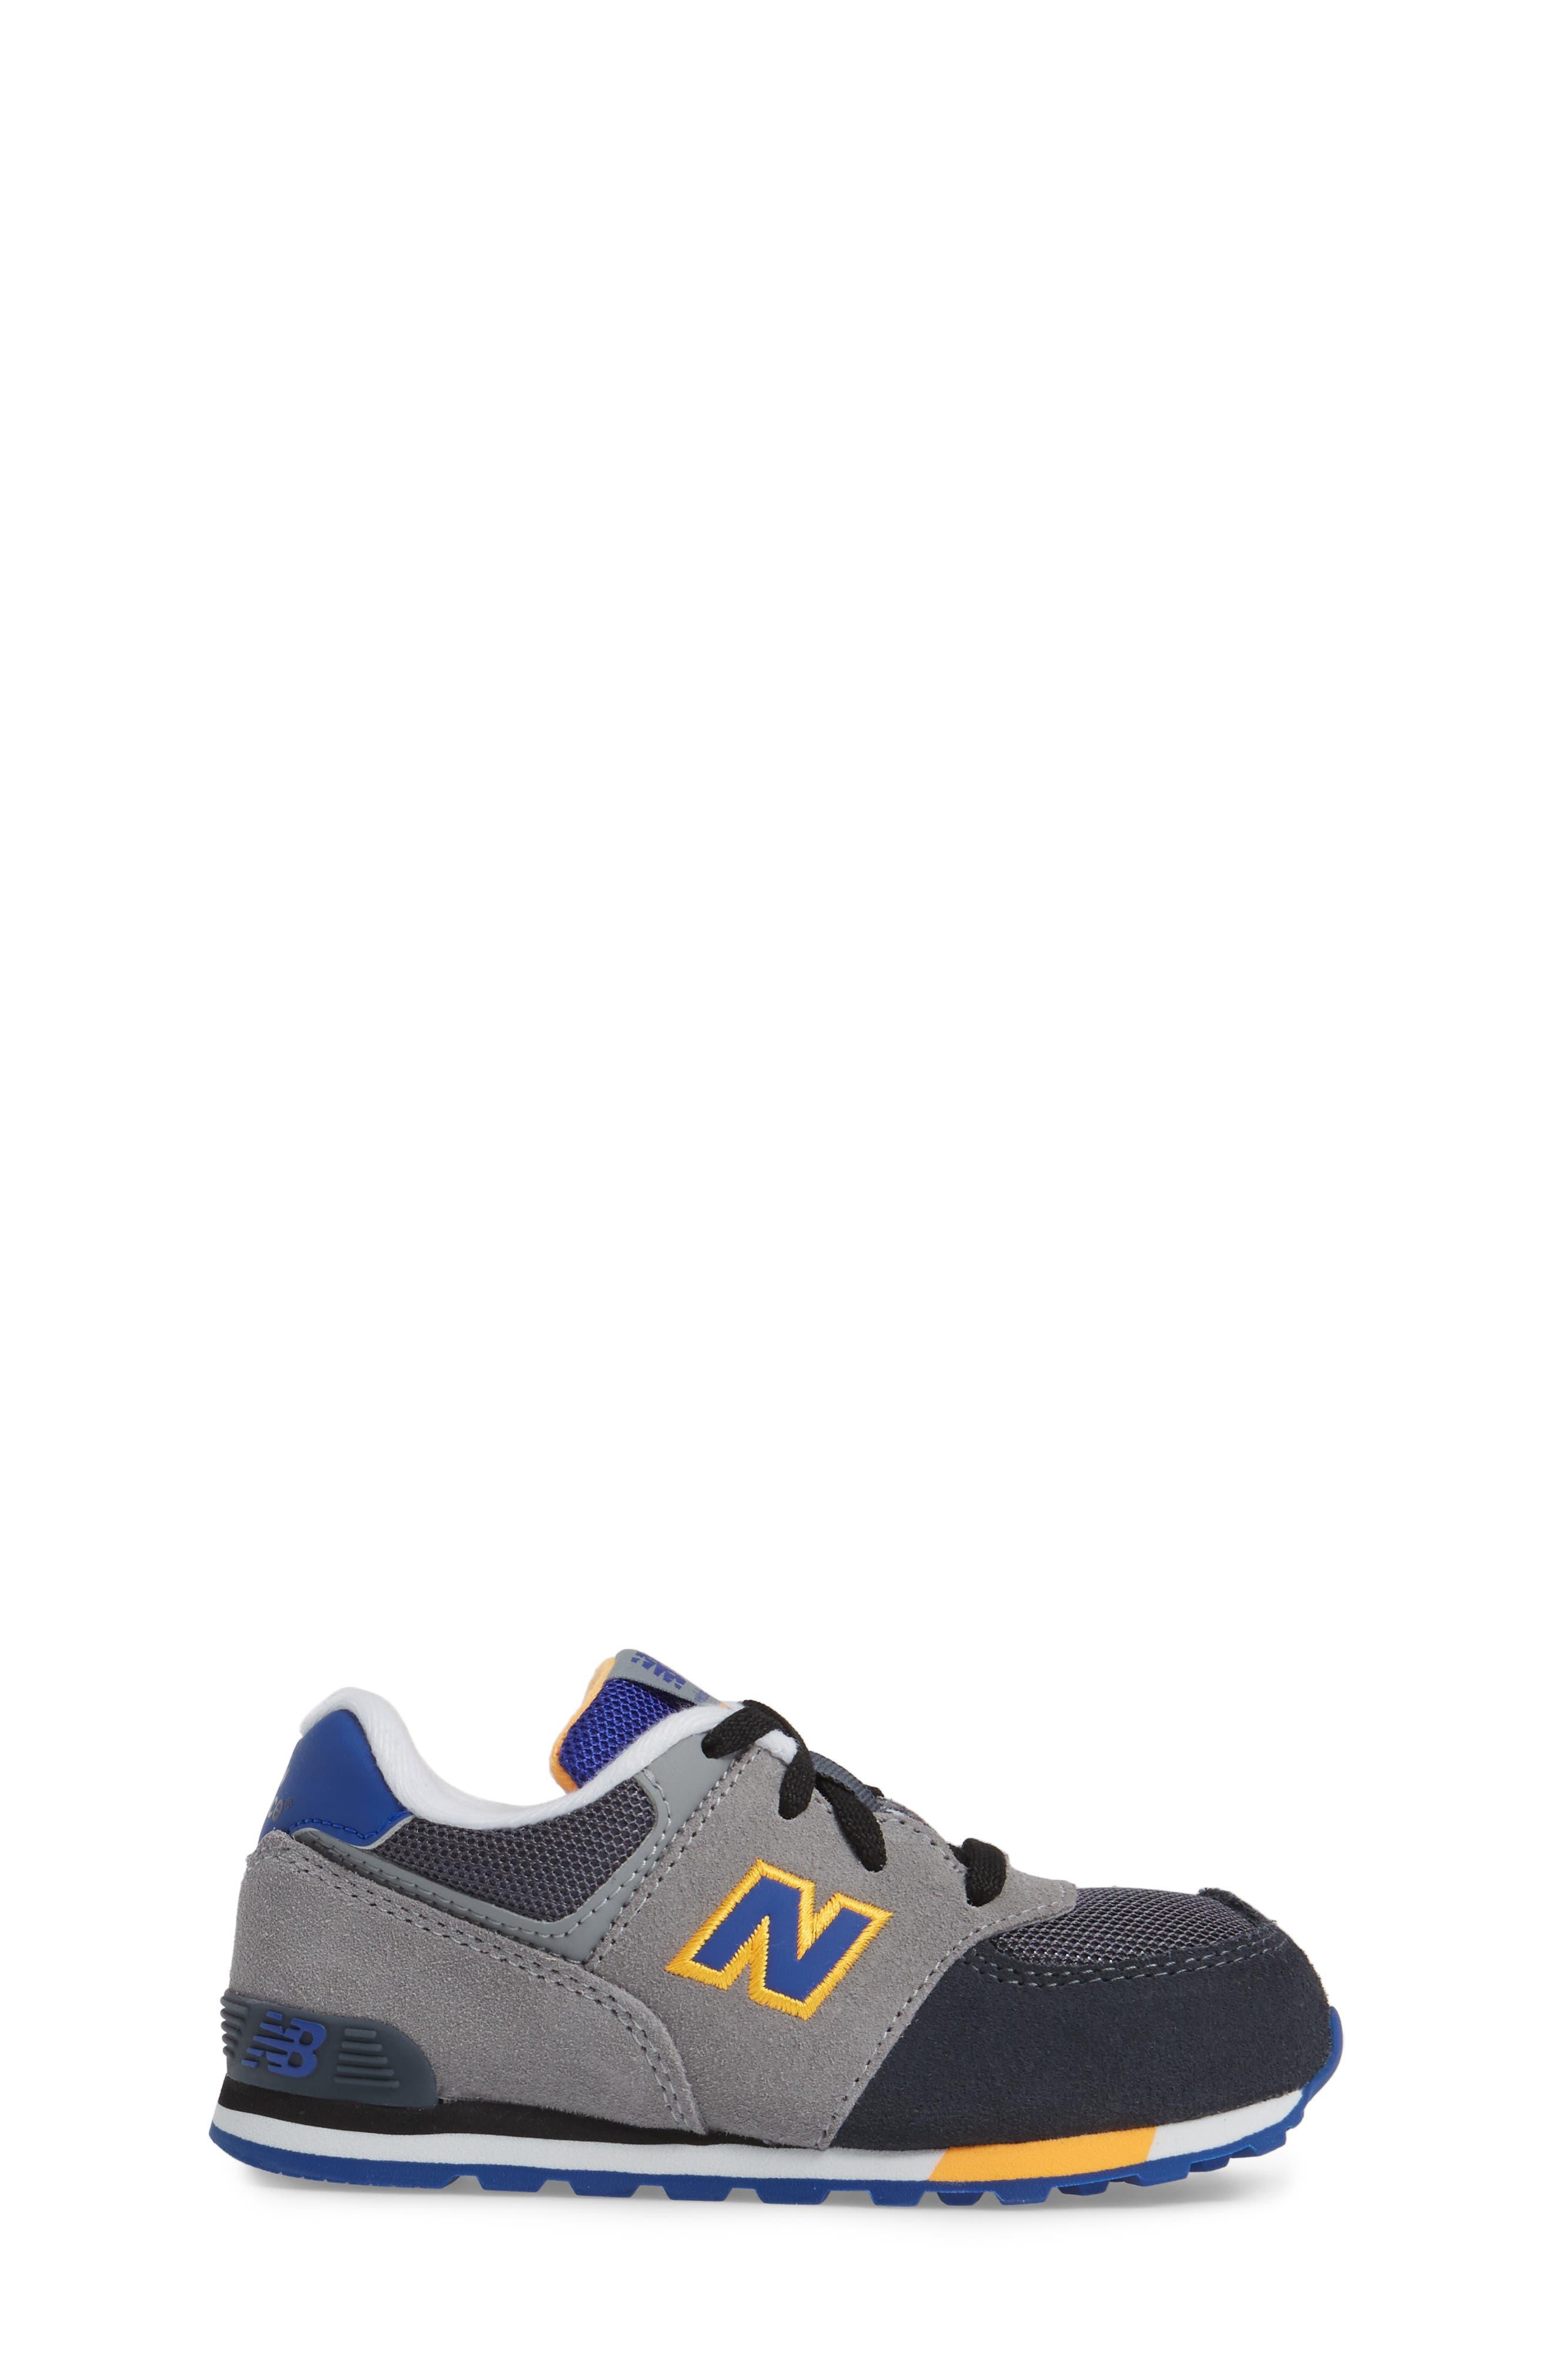 Alternate Image 3  - New Balance 574 Cut & Paste Sneaker (Baby, Walker & Toddler)